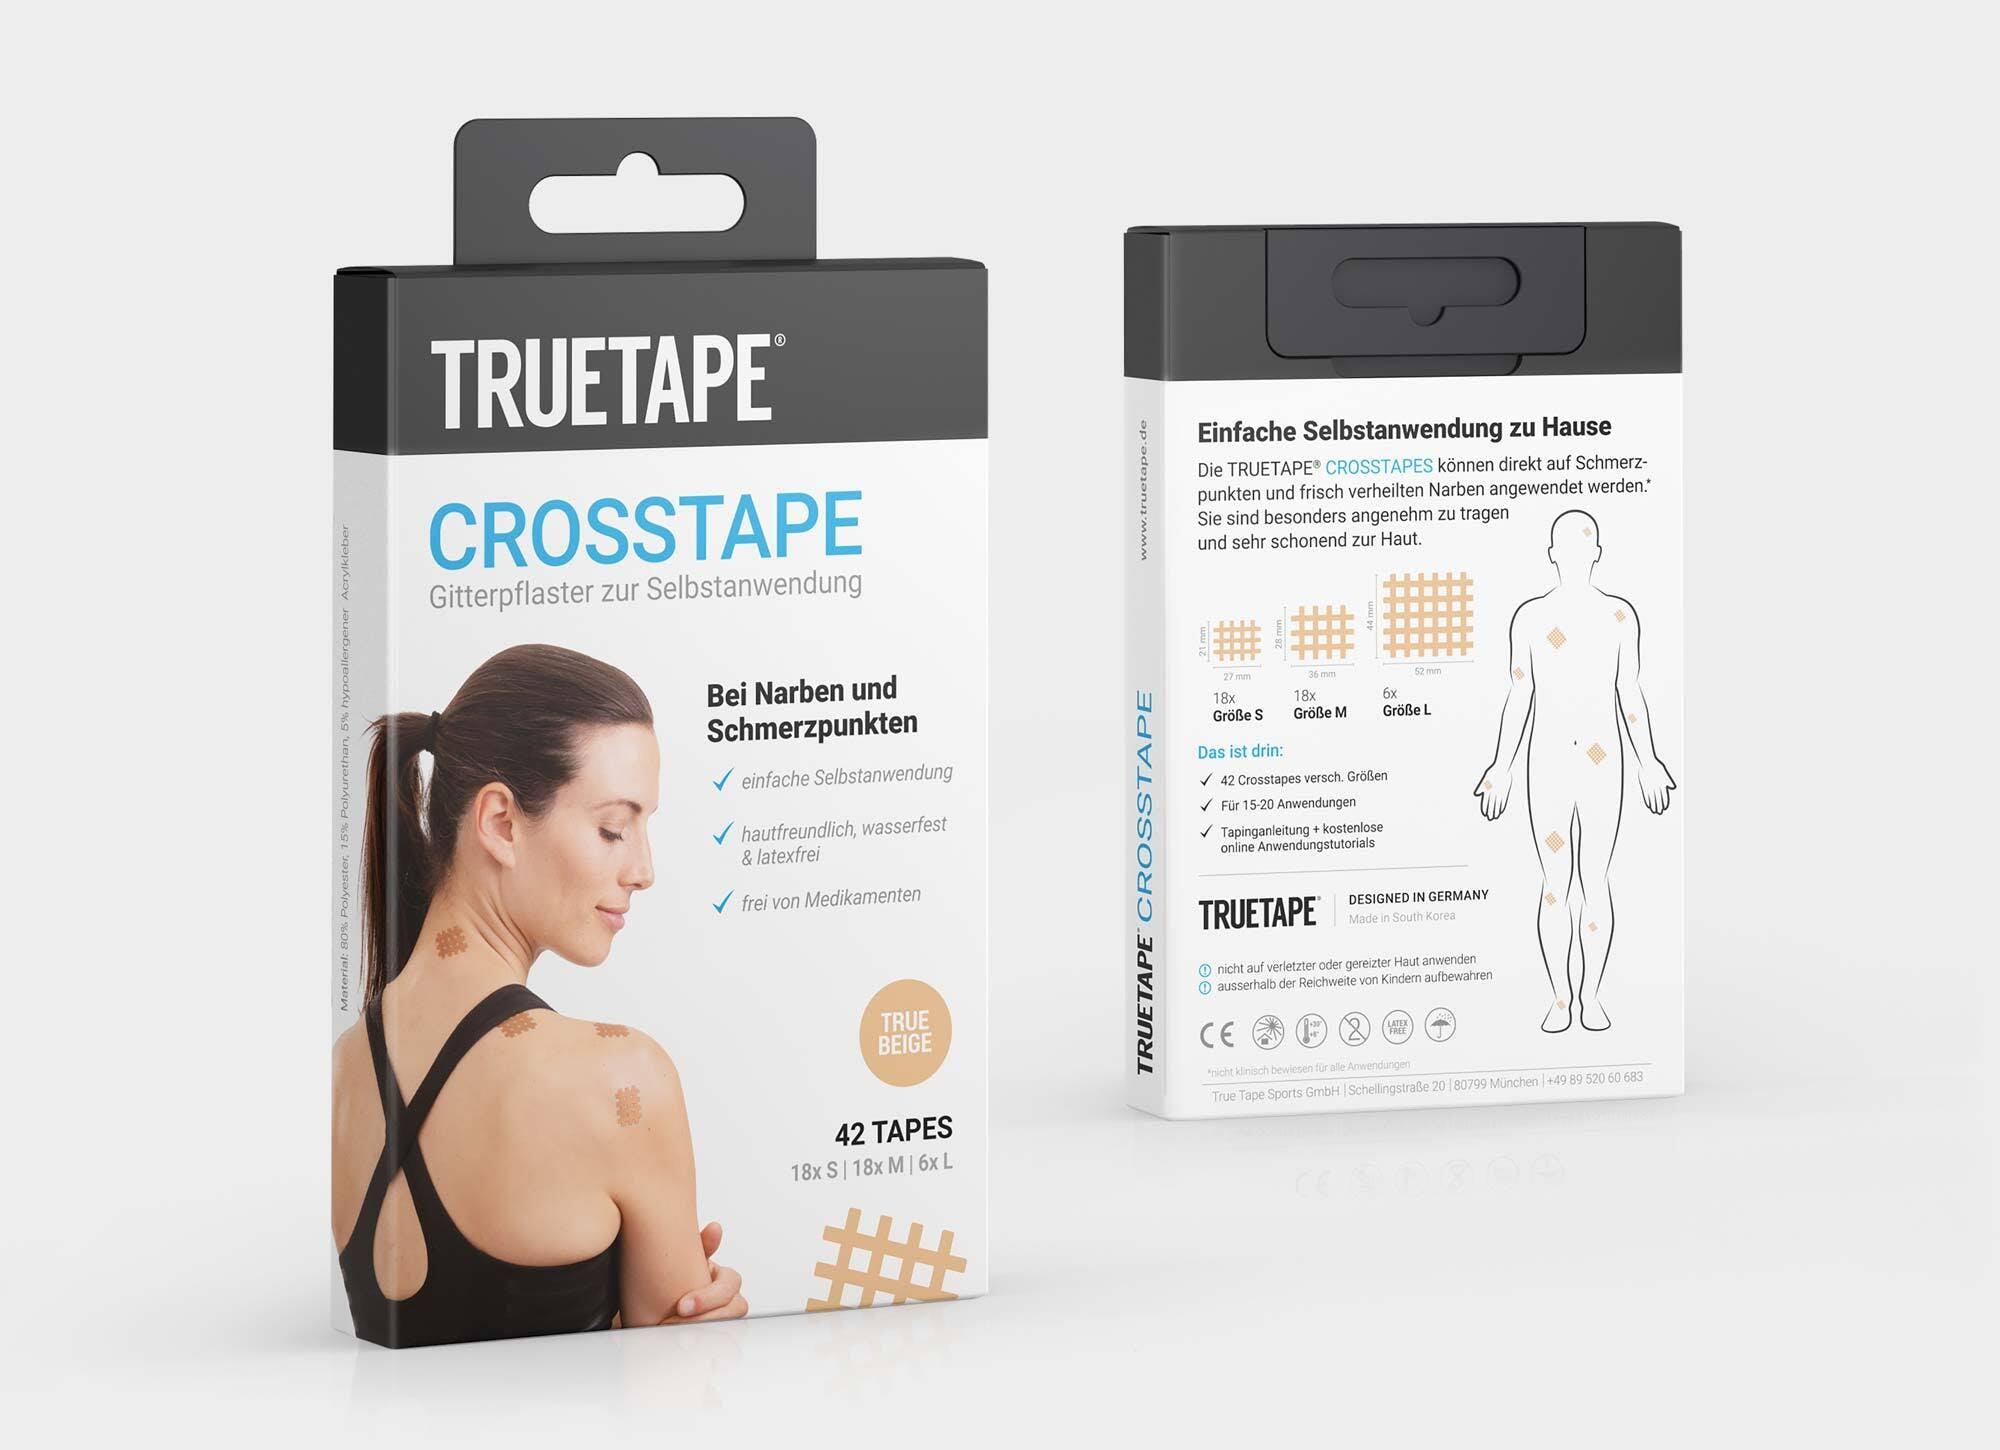 Truetape Crosstape Small Edition